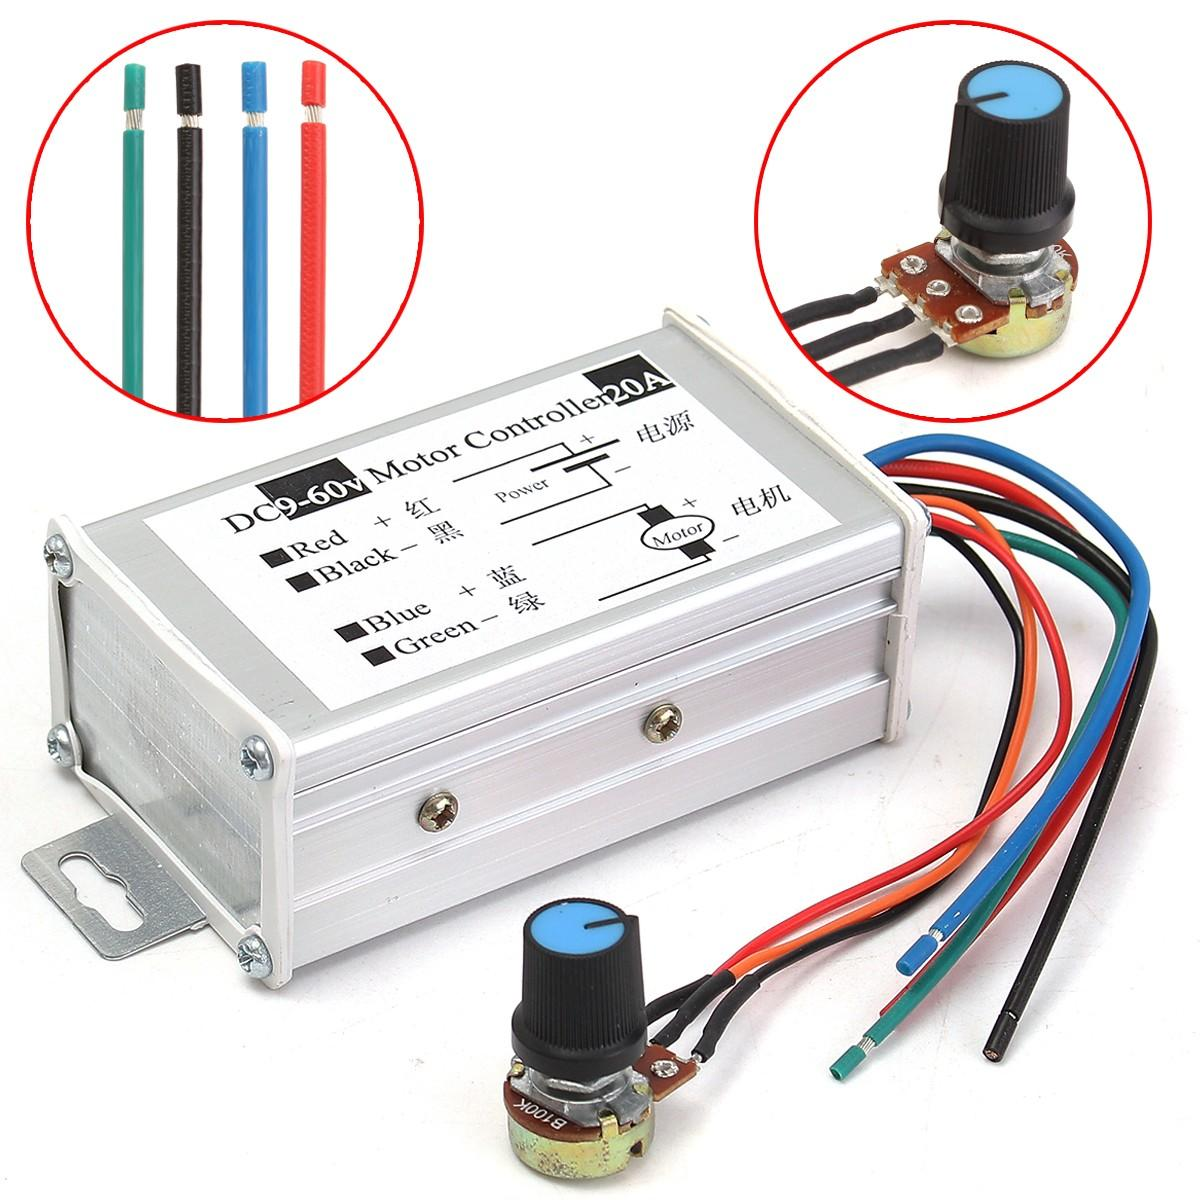 12V 24V 20A Max PWM DC Motor Stepless Adjustable Speed Controller 25kHz